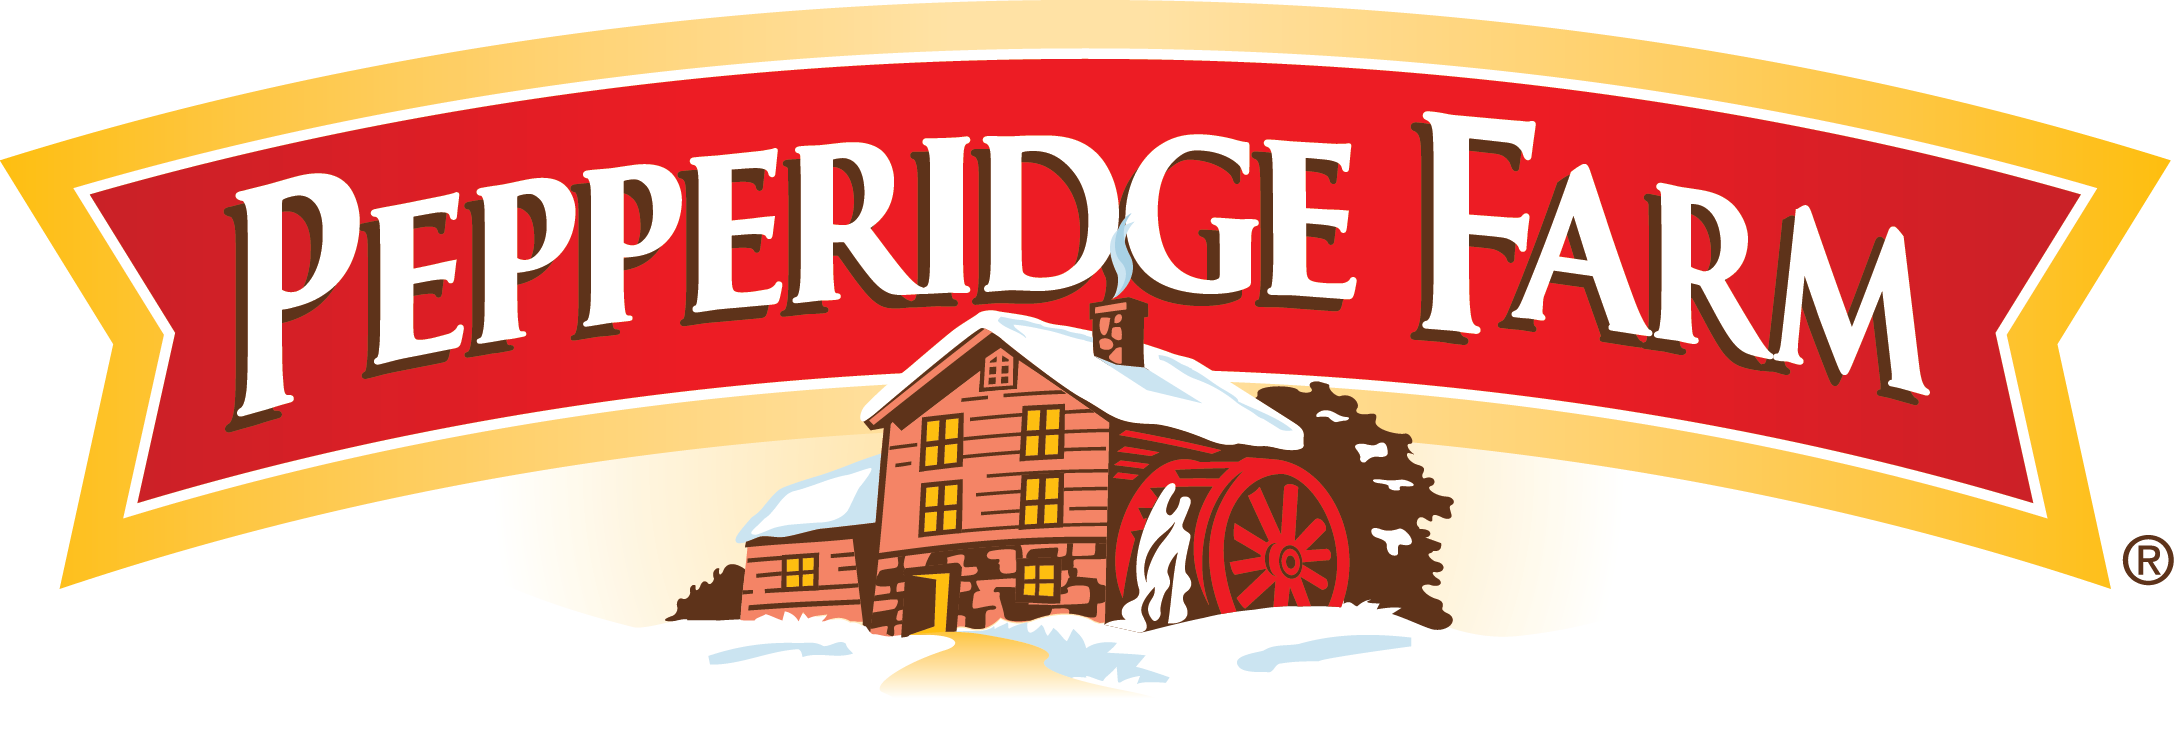 pepperidge farm.png